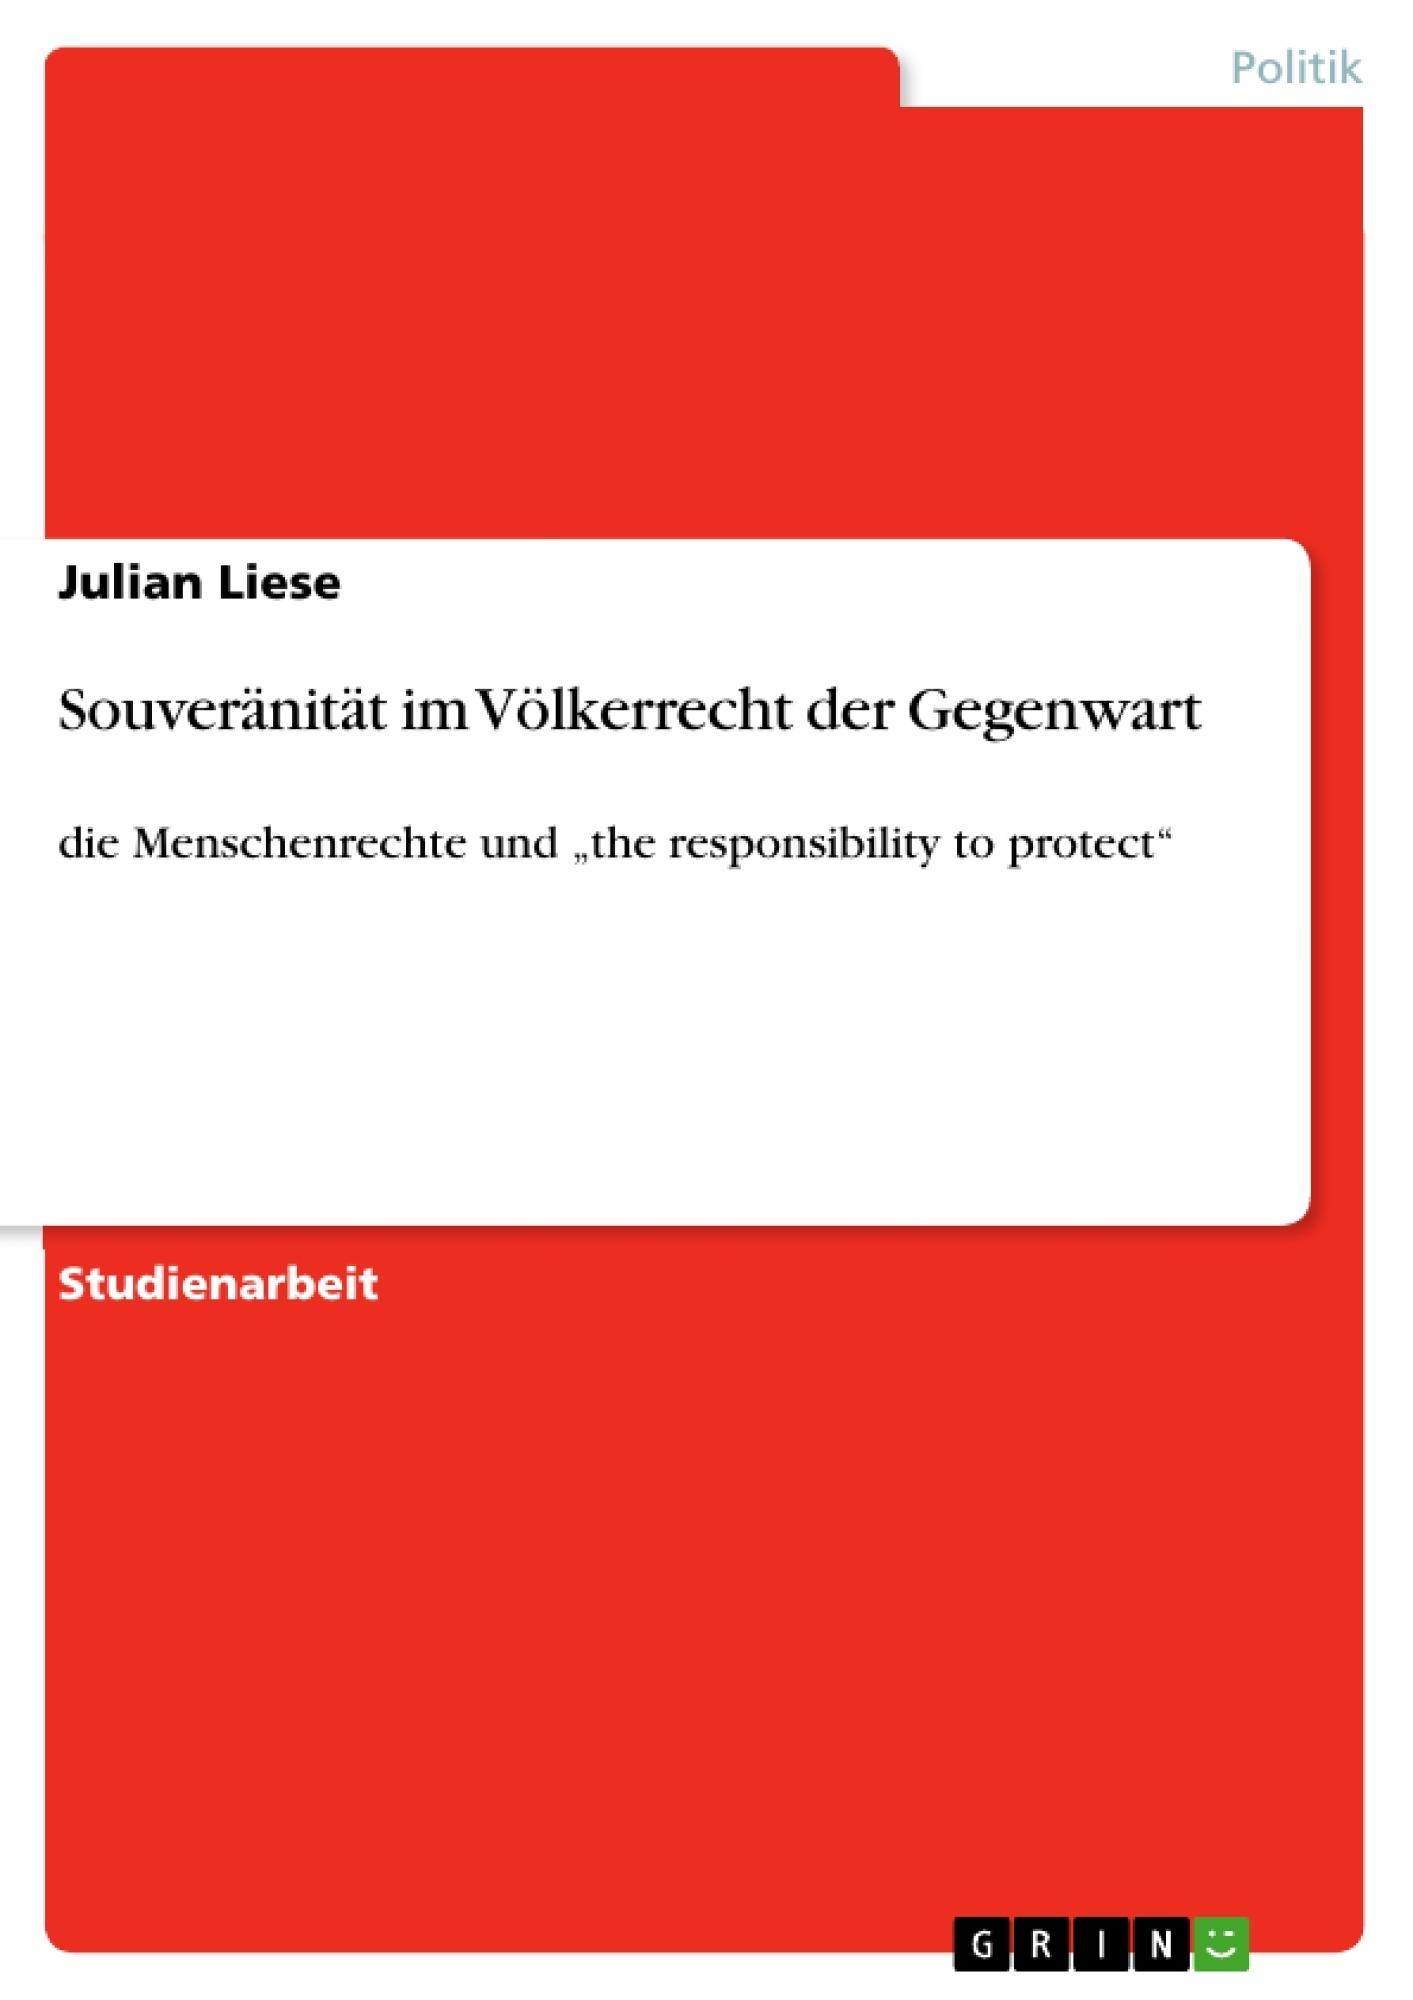 Titel: Souveränität im Völkerrecht der Gegenwart